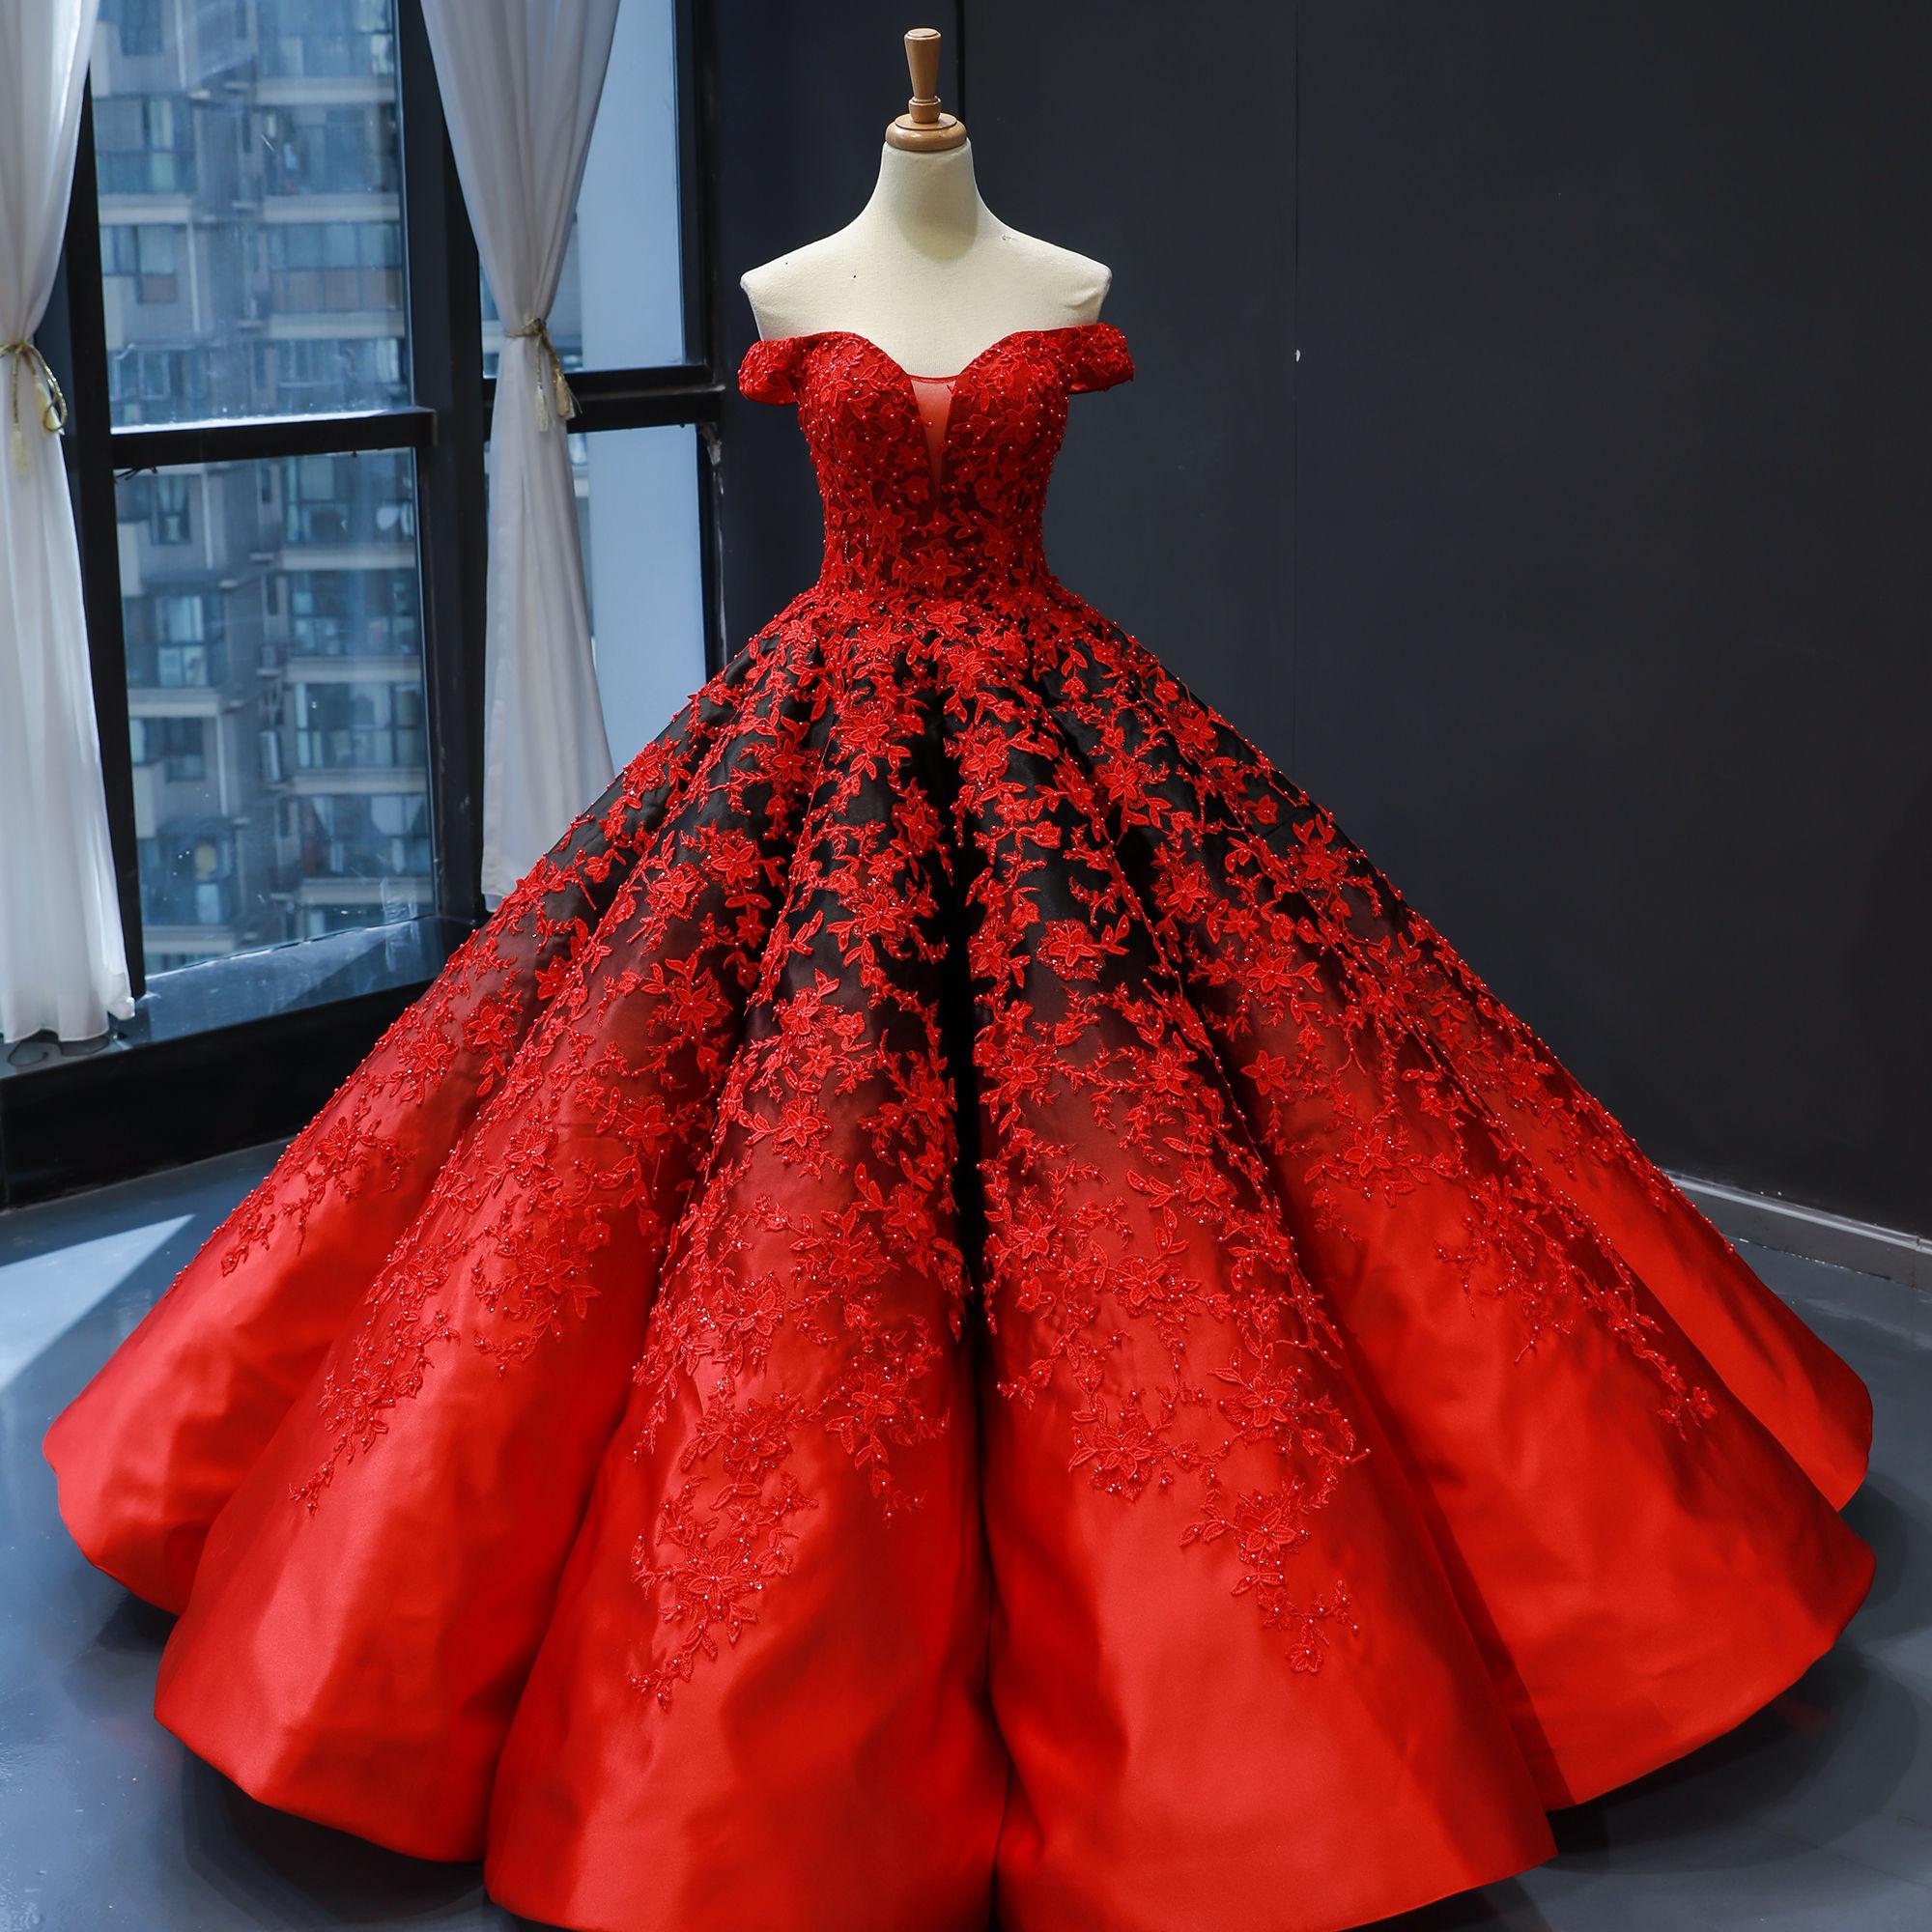 Платье бальное картинка